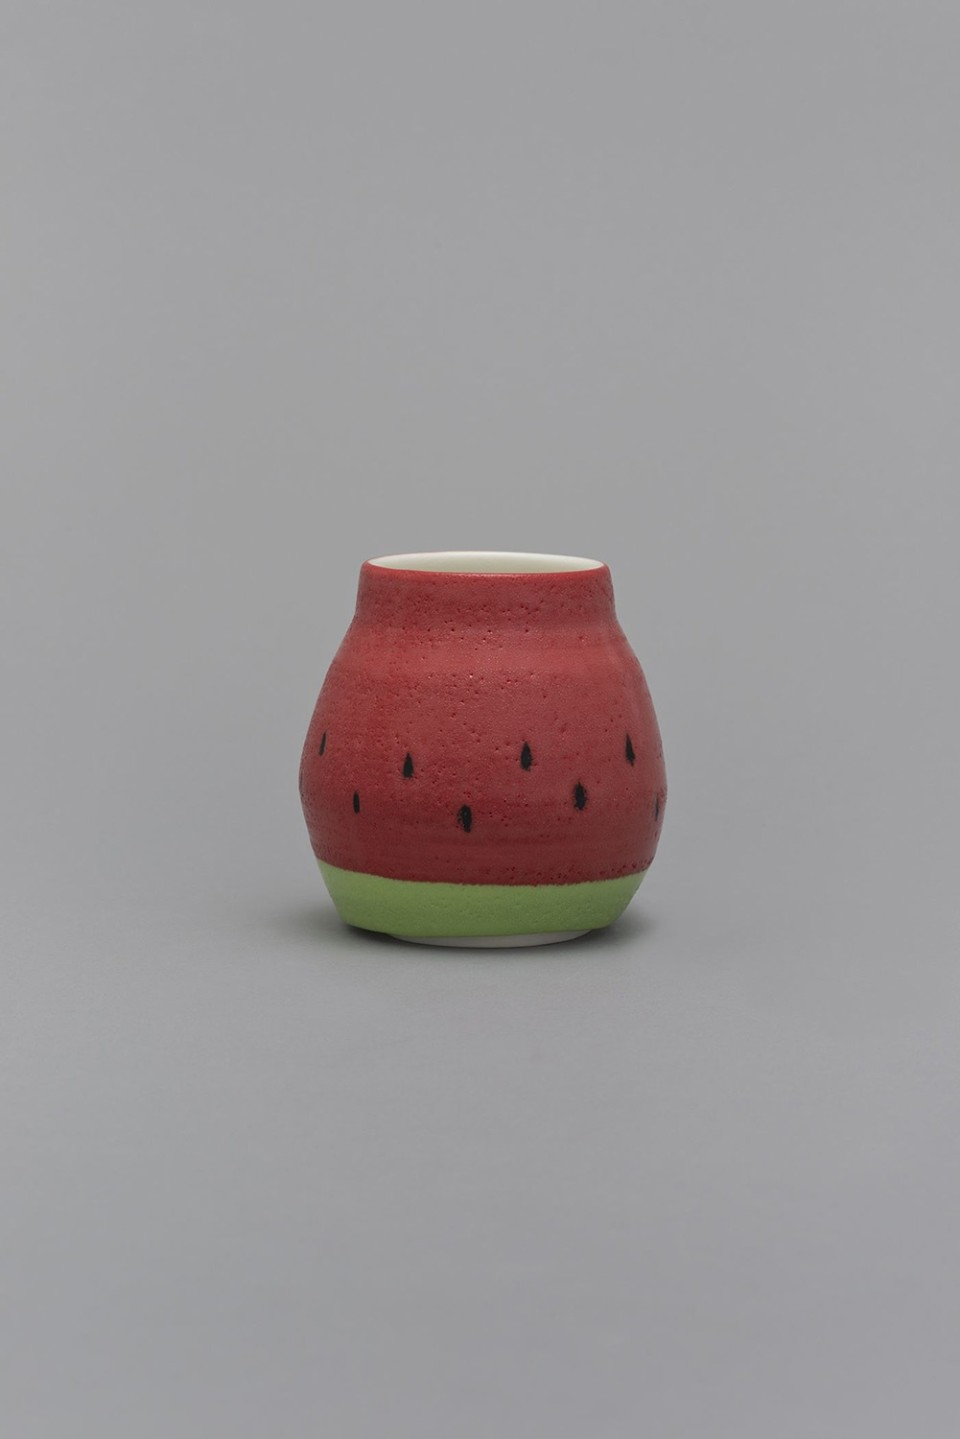 Image: Shio Kusaka  (watermelon 7), 2015  porcelain  5-1/4 x 5 x 5 inches